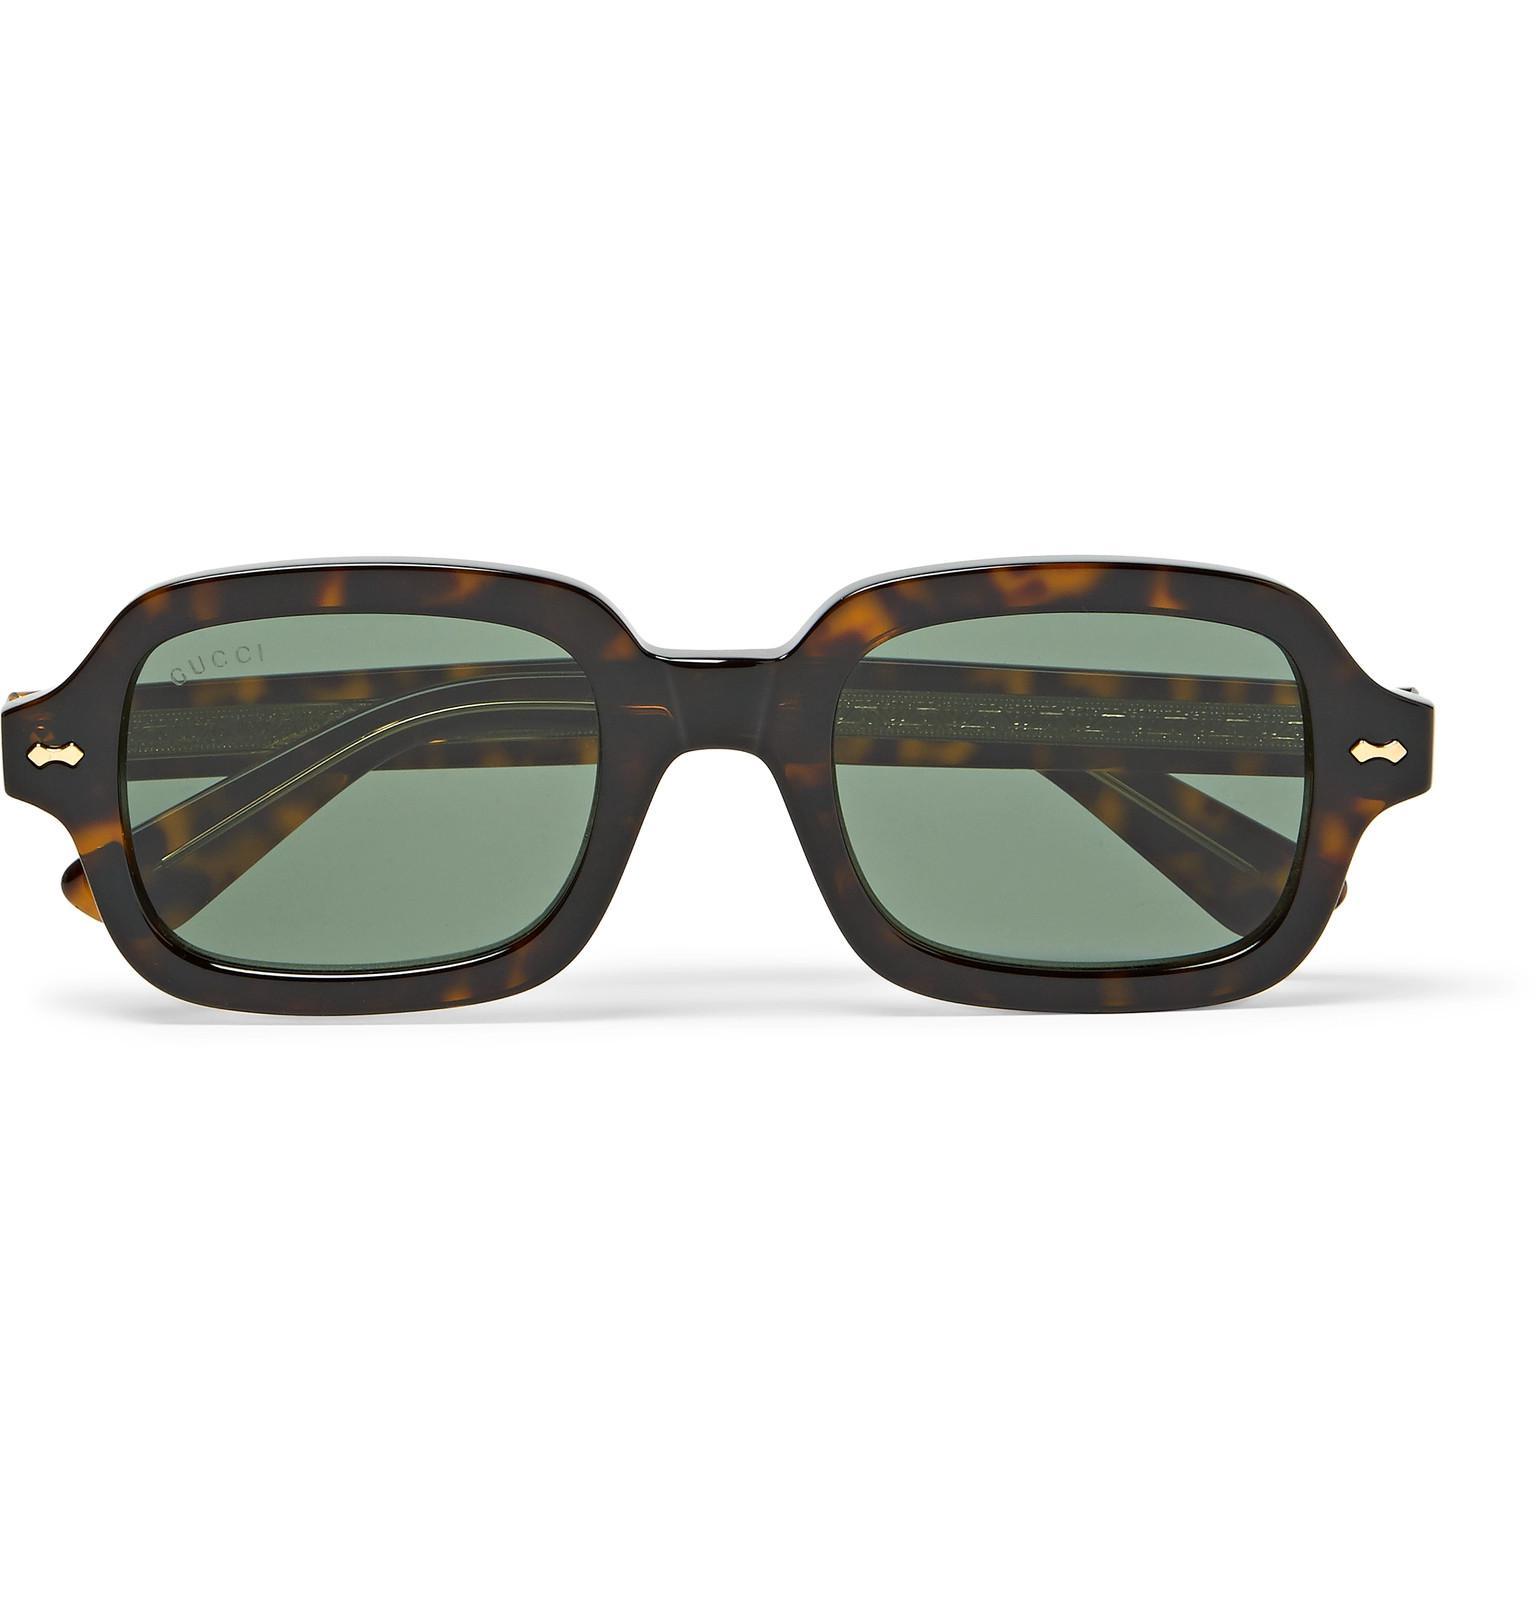 6f1b5e363b Gucci Square-frame Tortoiseshell Acetate Sunglasses in Brown for Men ...